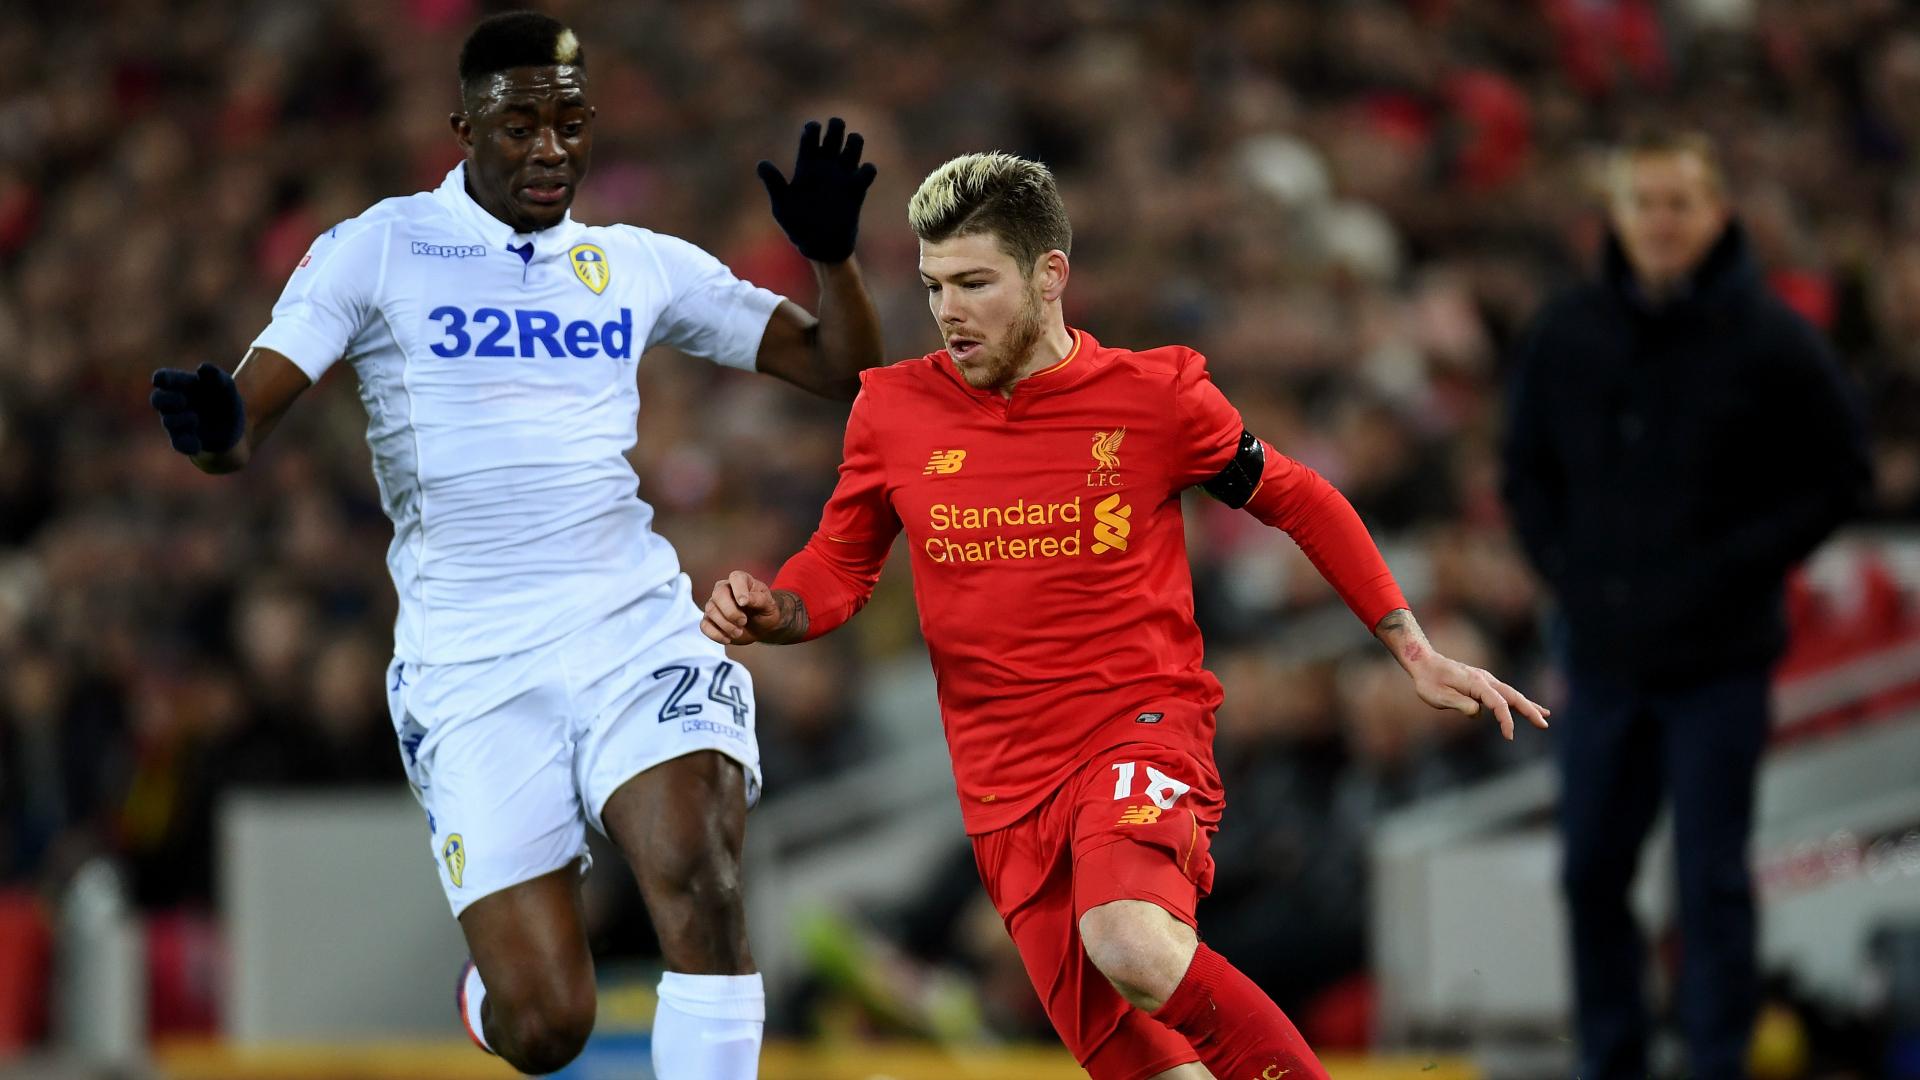 Alberto Moreno Hadi Sacko Liverpool Leeds United 11292016